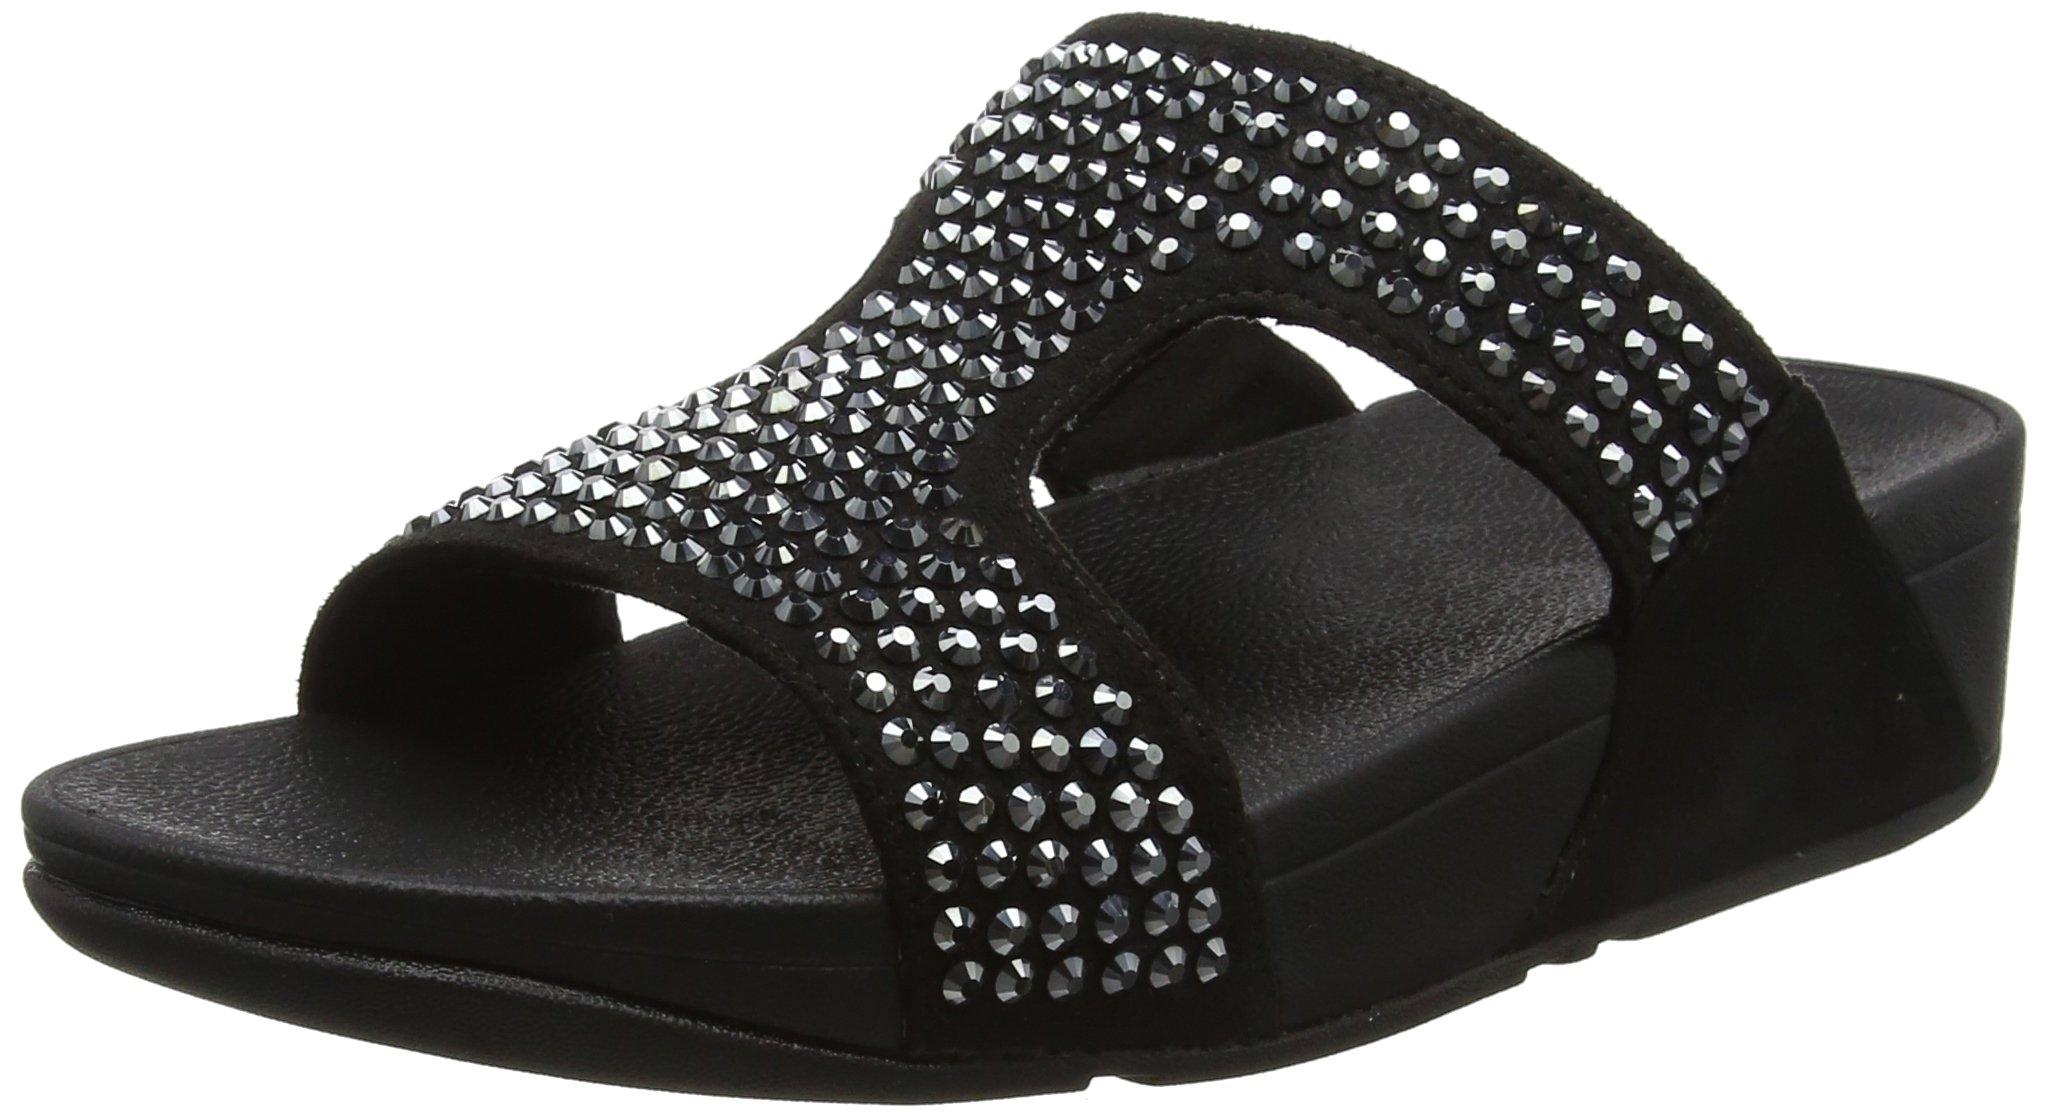 Fitflop Eu SandalsBout FemmeNoirblack 139 Glitzie Slide Ouvert tshoQrCdxB